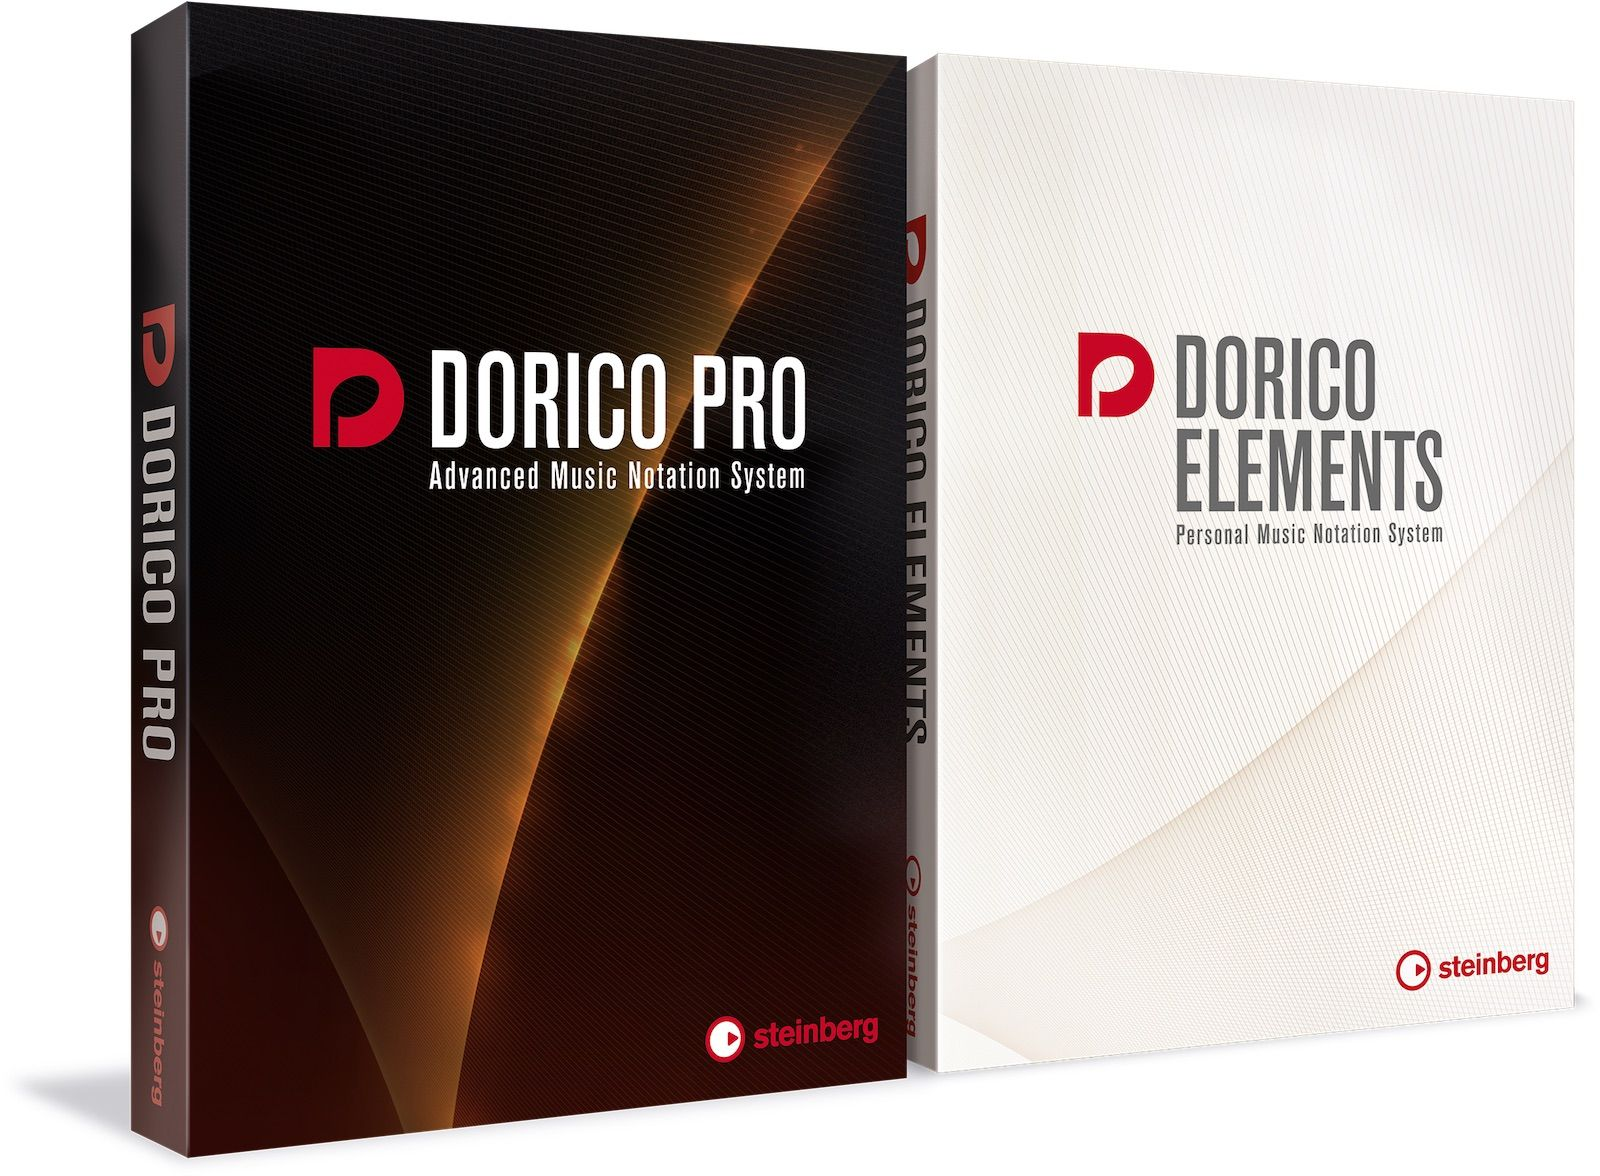 dorico-family.jpg